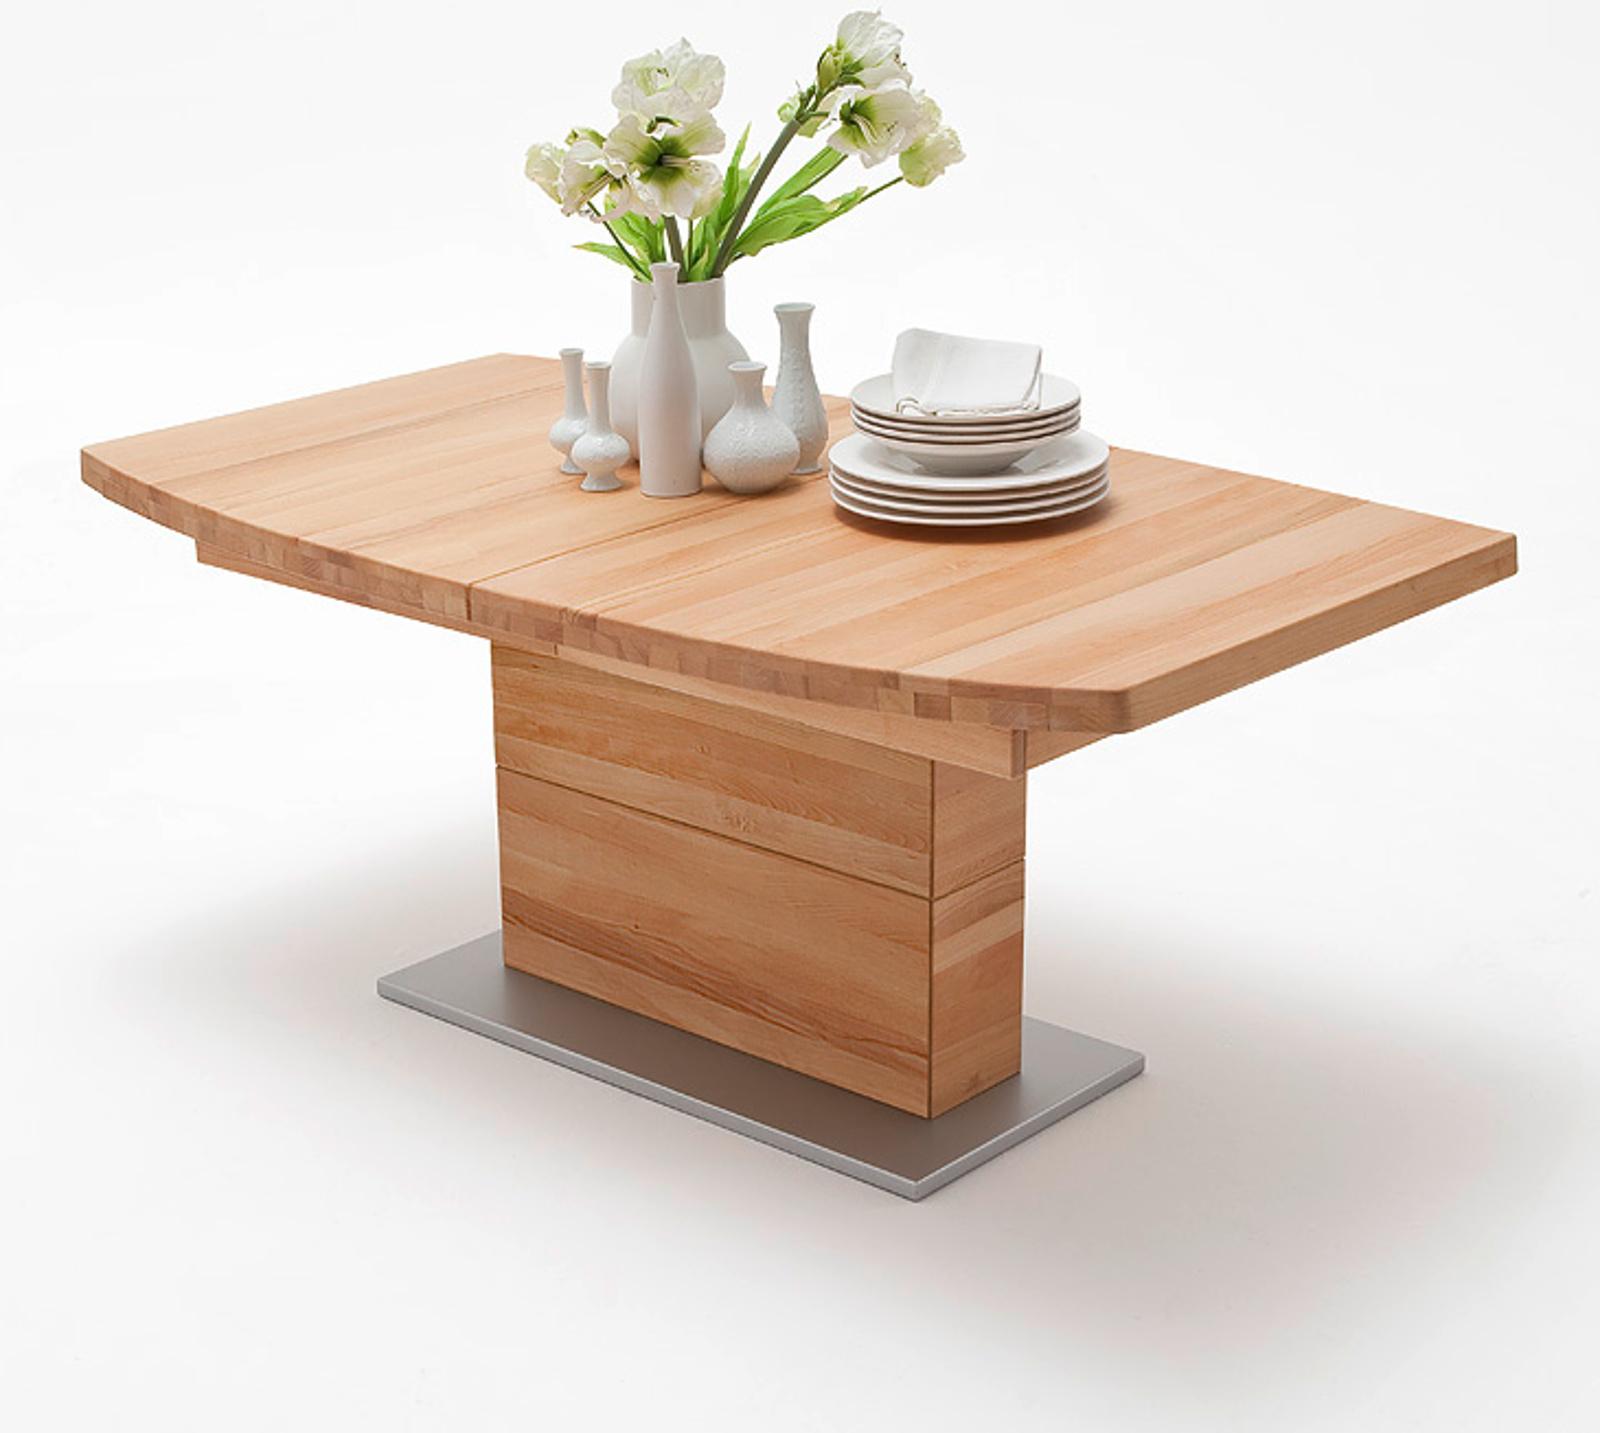 stauraumbett hochbett kinderbett bett weiss anthrazit rochesso ebay. Black Bedroom Furniture Sets. Home Design Ideas